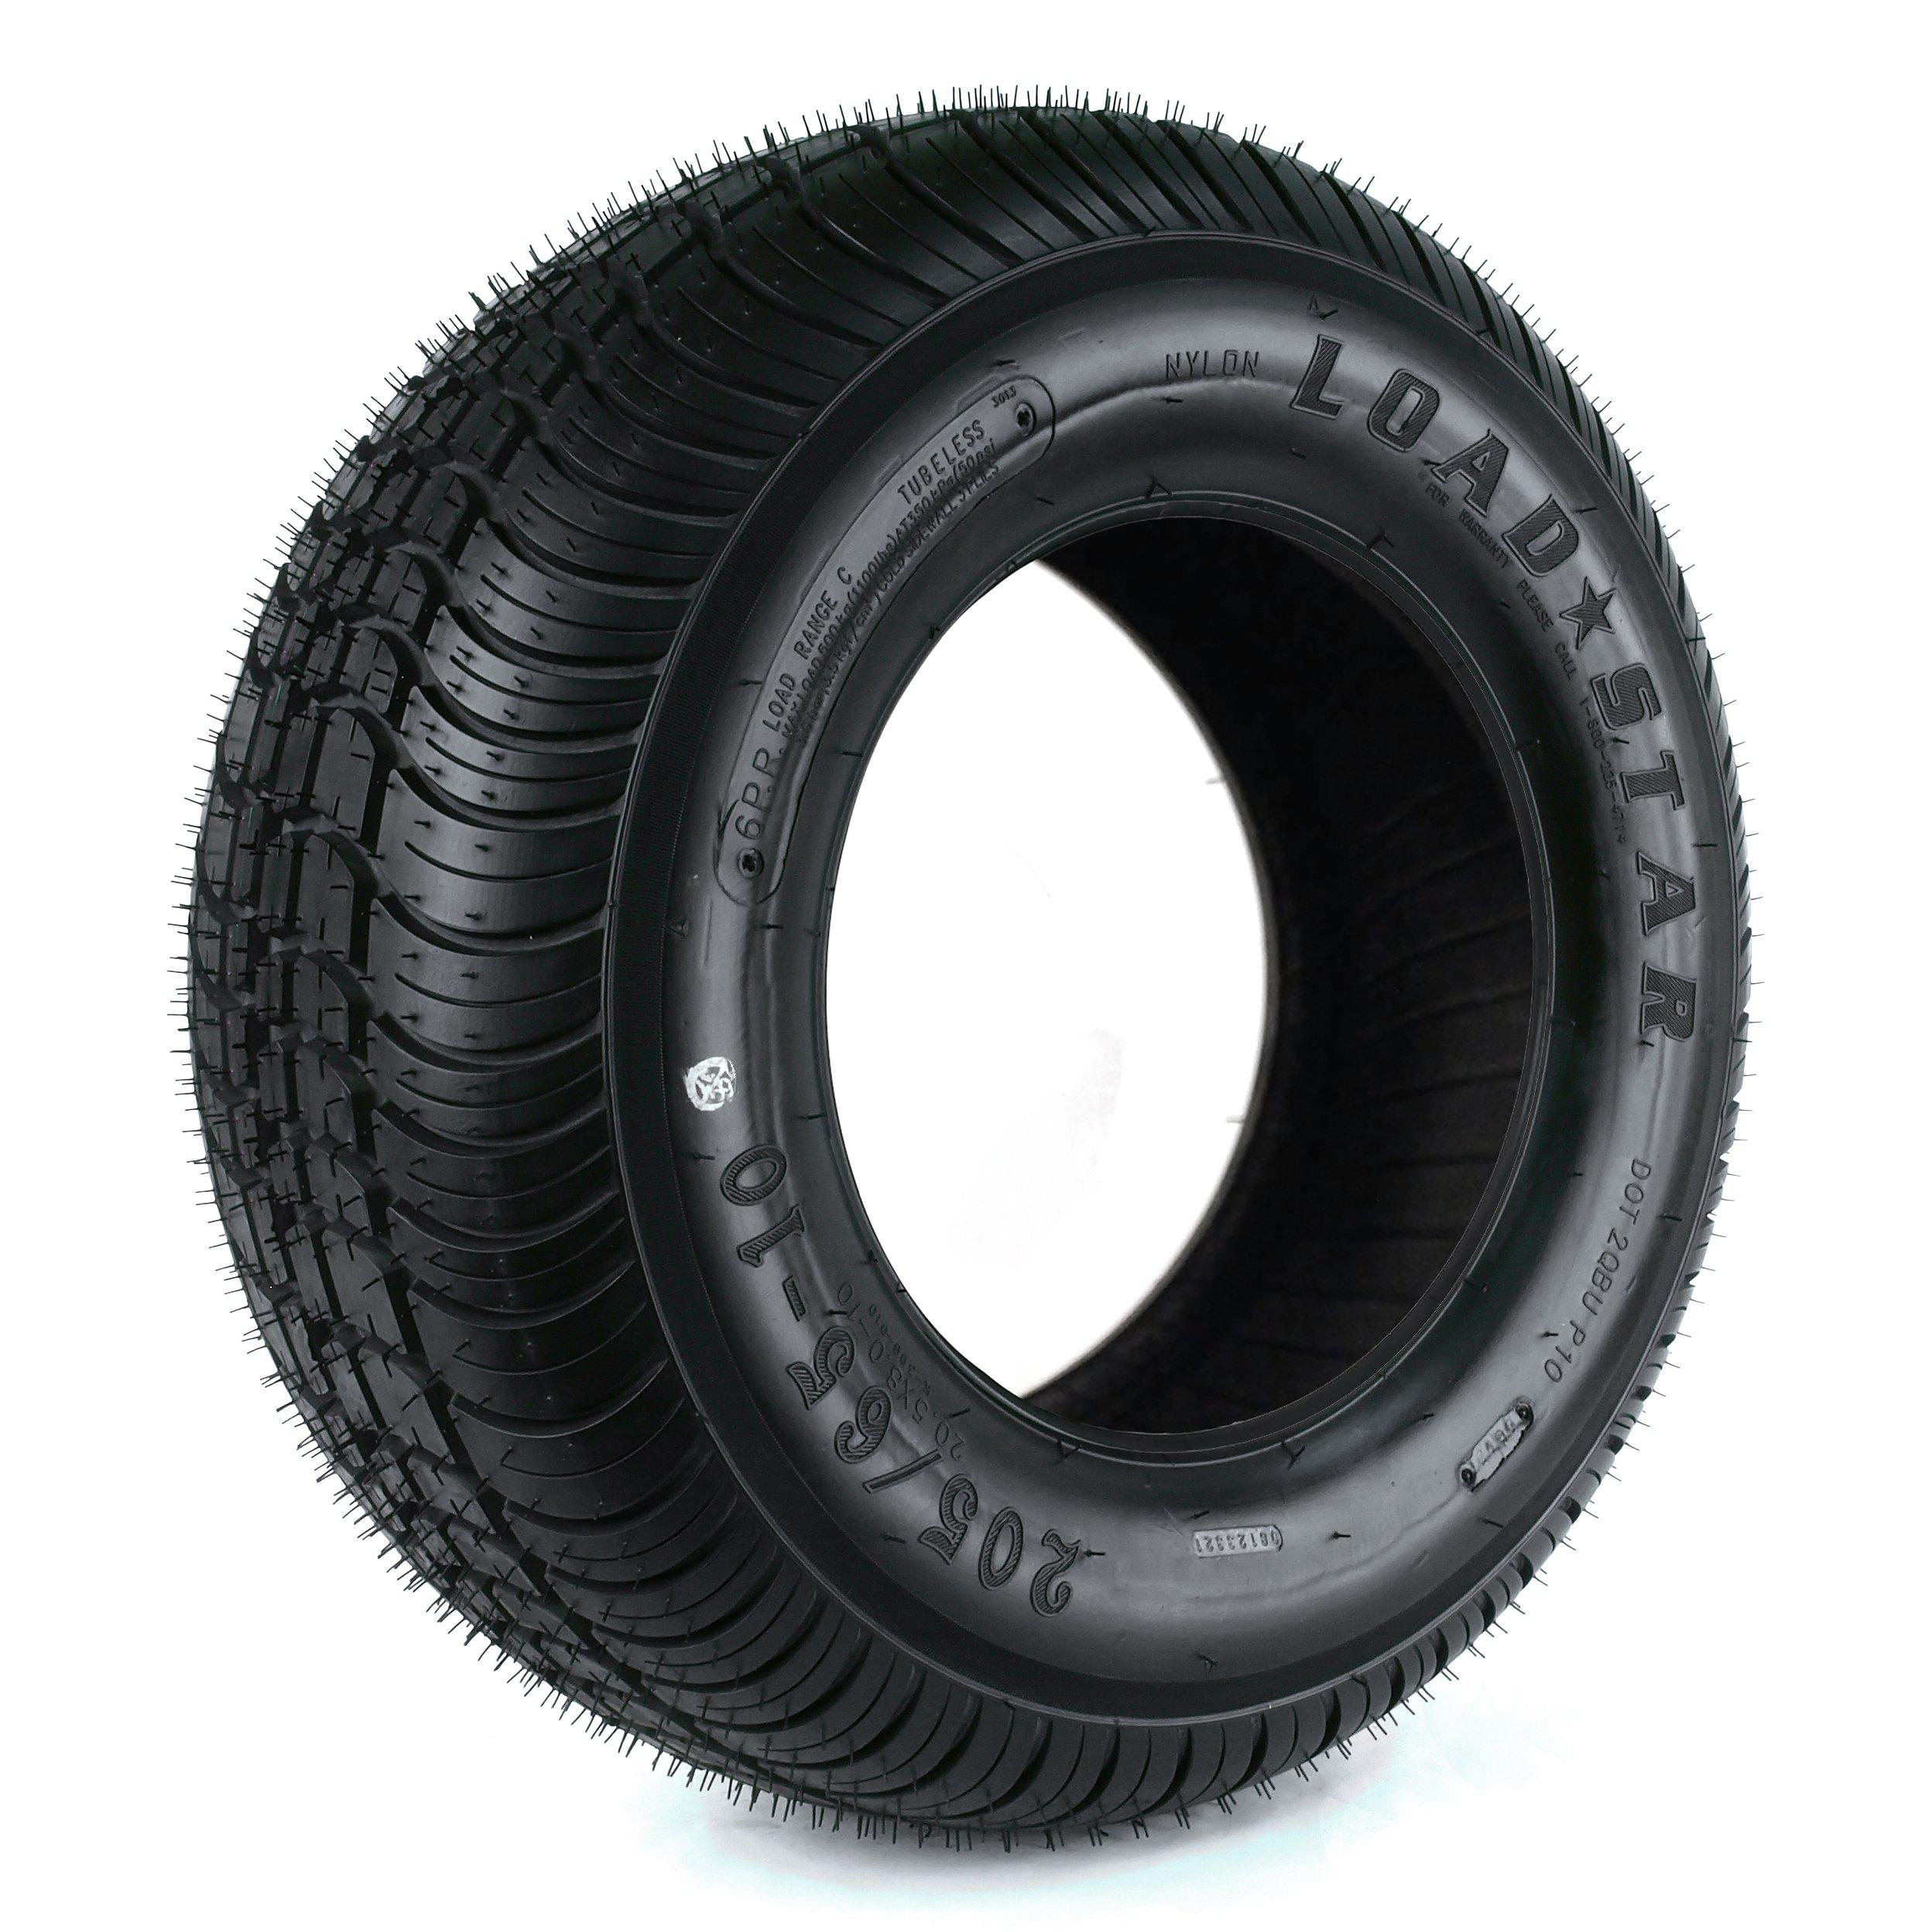 Kenda Loadstar Bias Trailer Tire - 205/65-10 55C